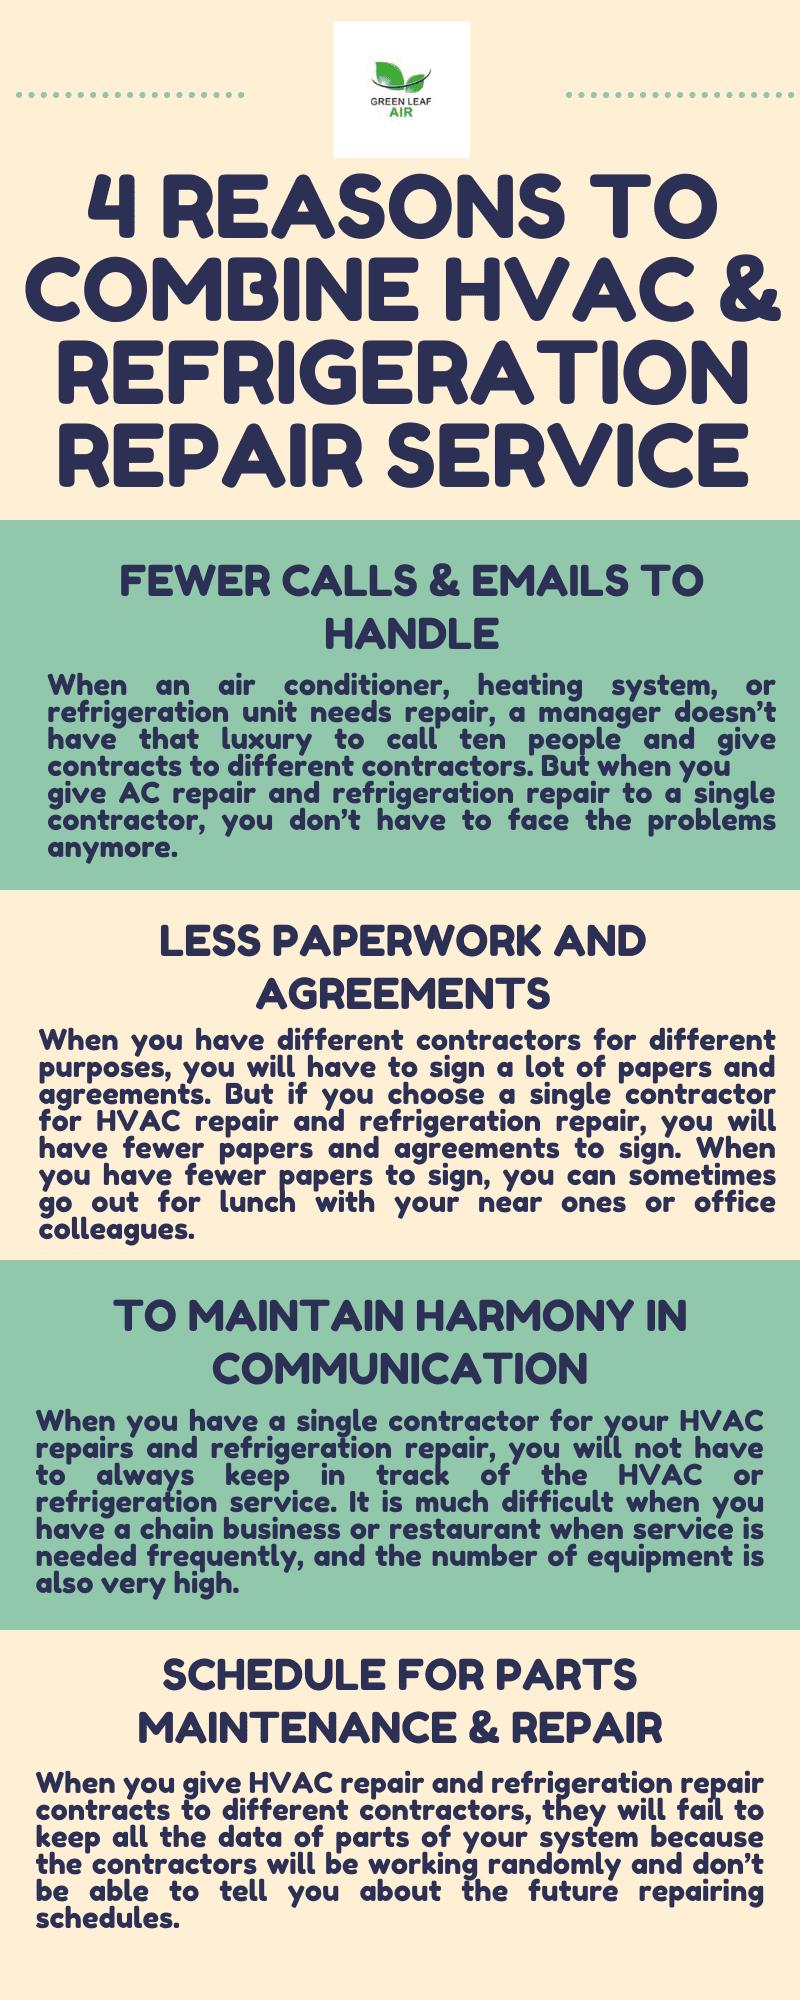 4 Reasons to Combine HVAC & Refrigeration Repair Service